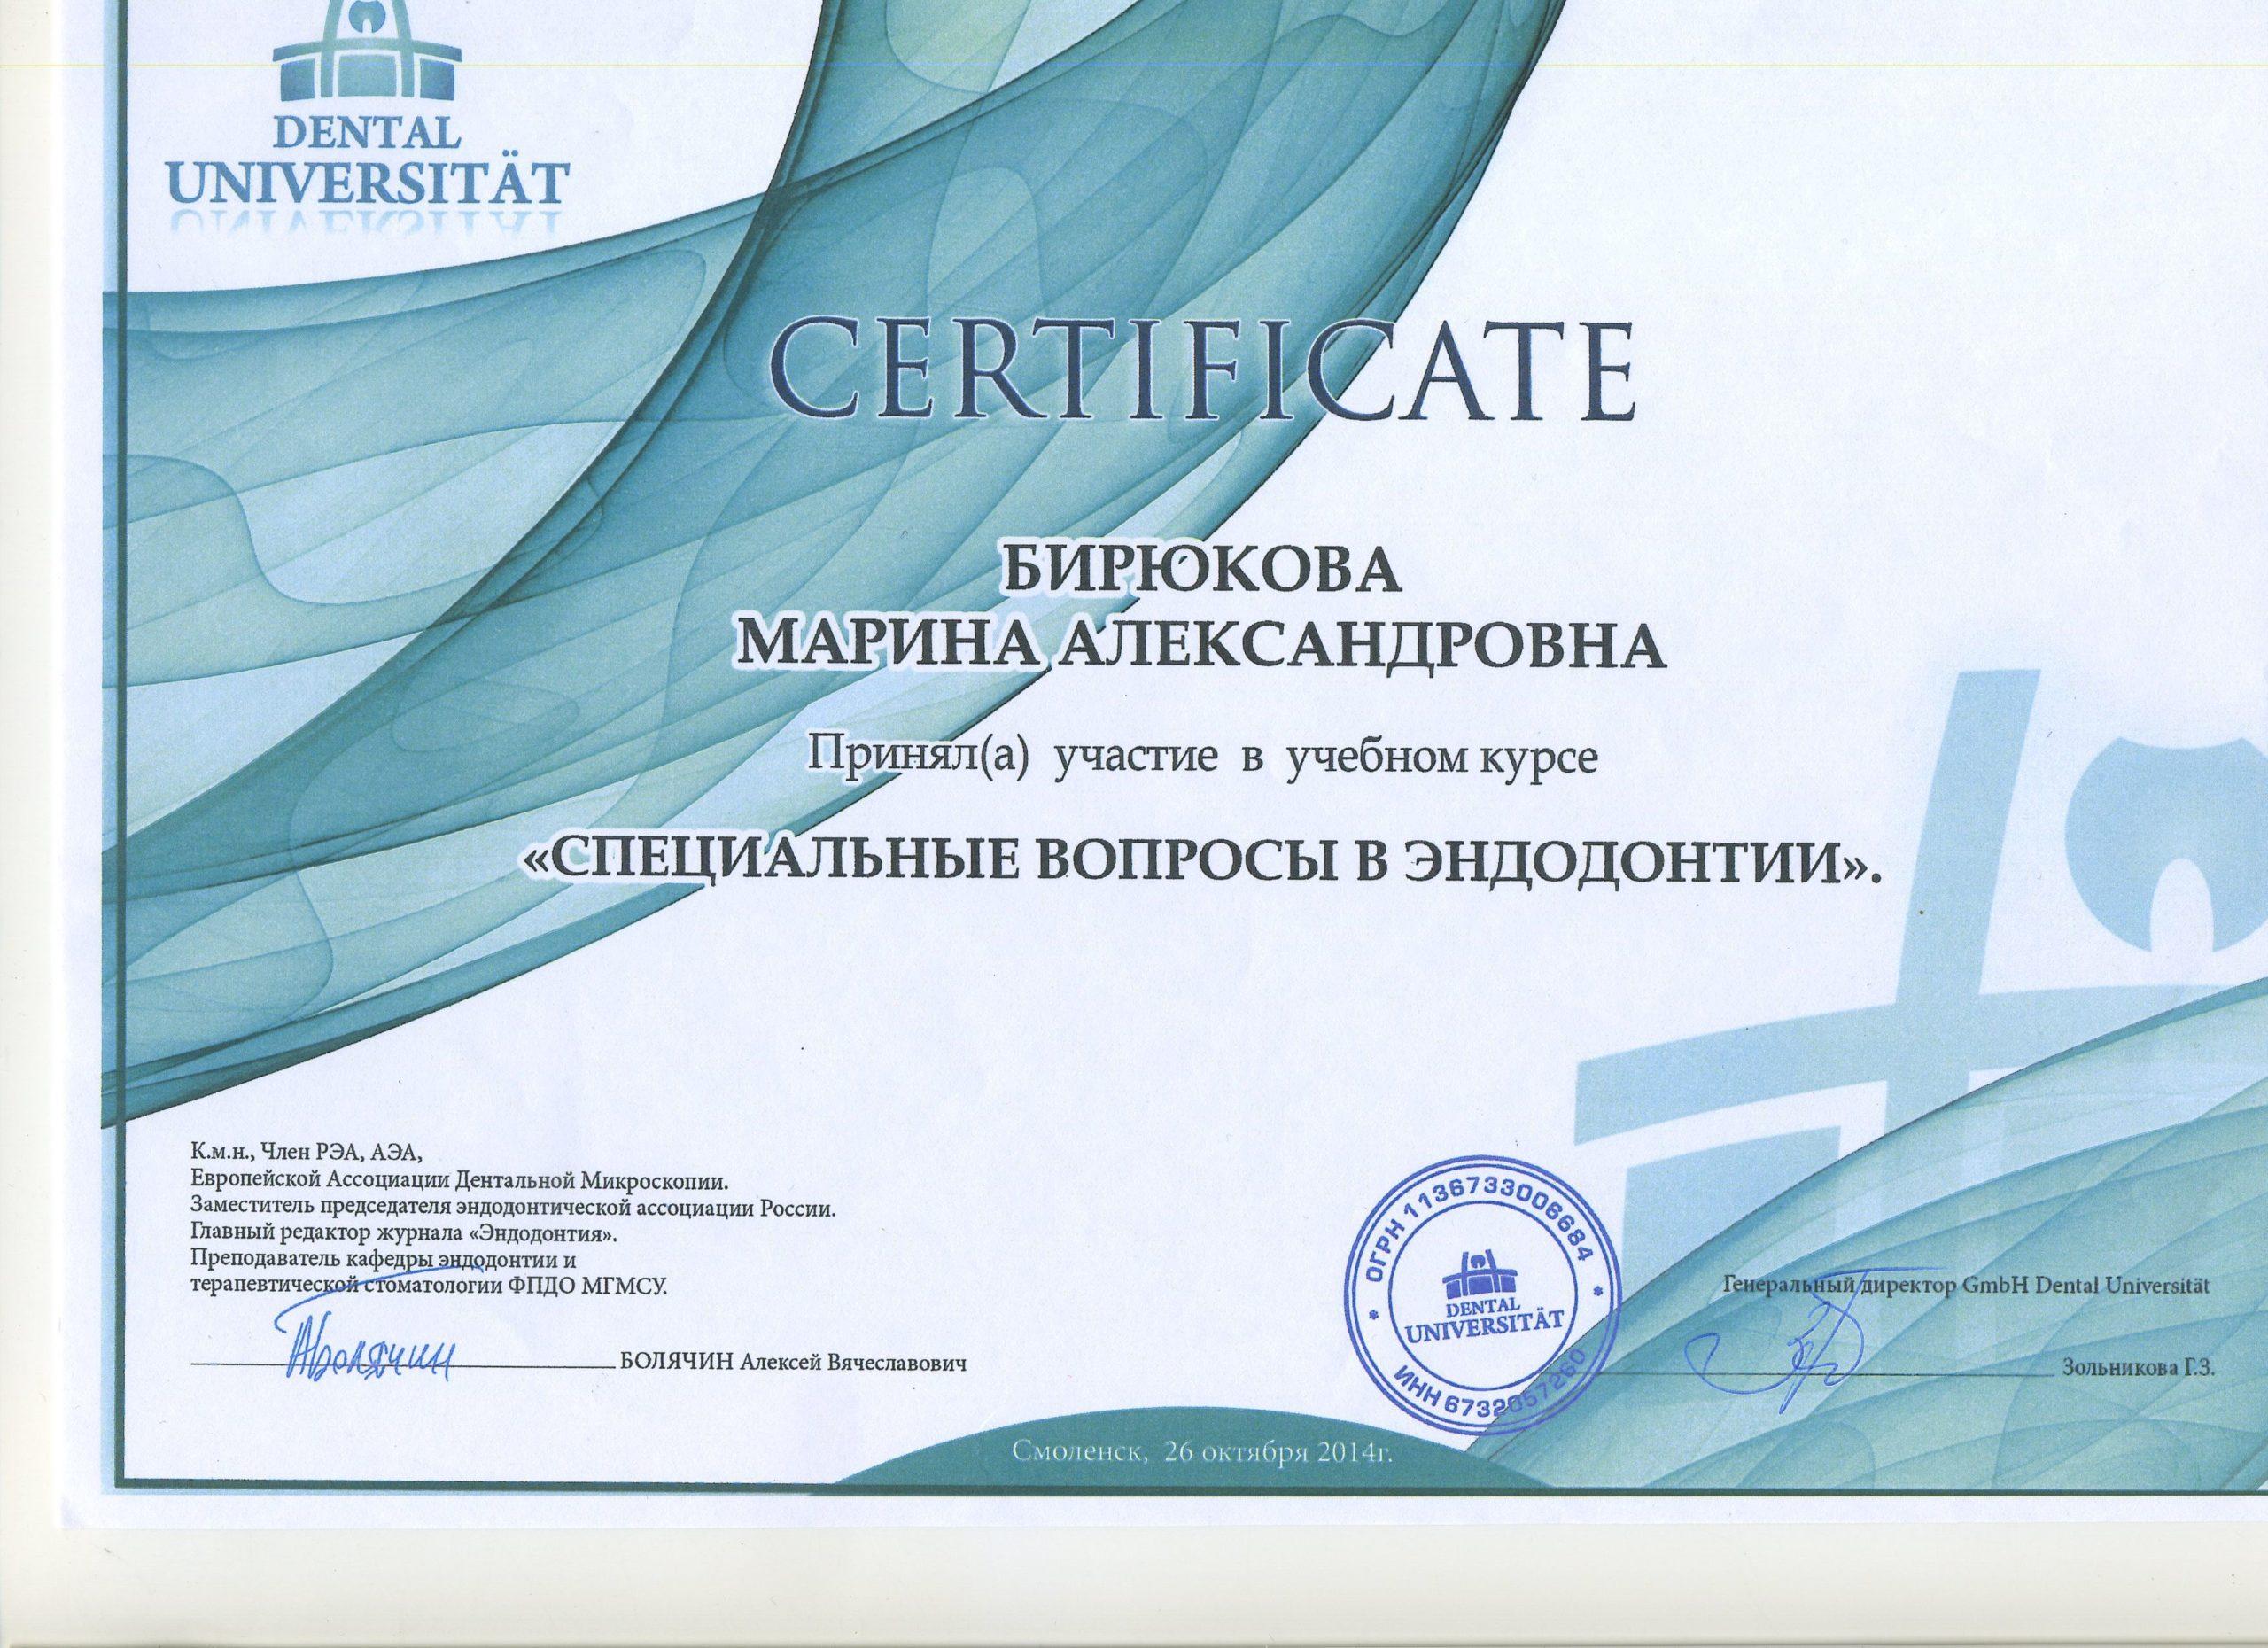 Сертифиат Жилеткова Марина Александровна_03